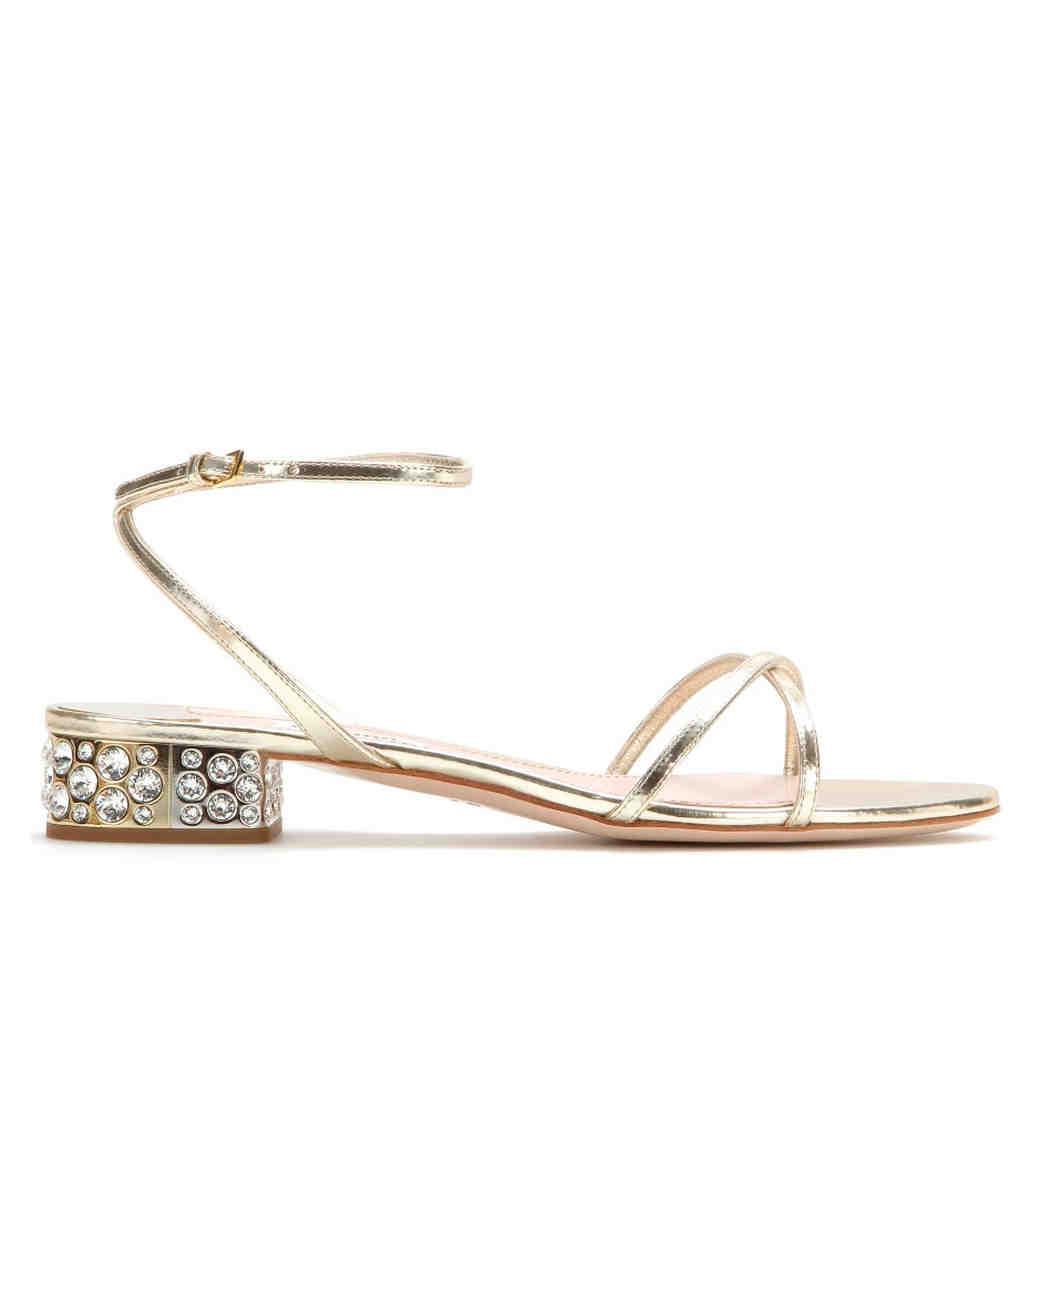 summer-wedding-shoes-miu-miu-metallic-leather-sandals-0515.jpg